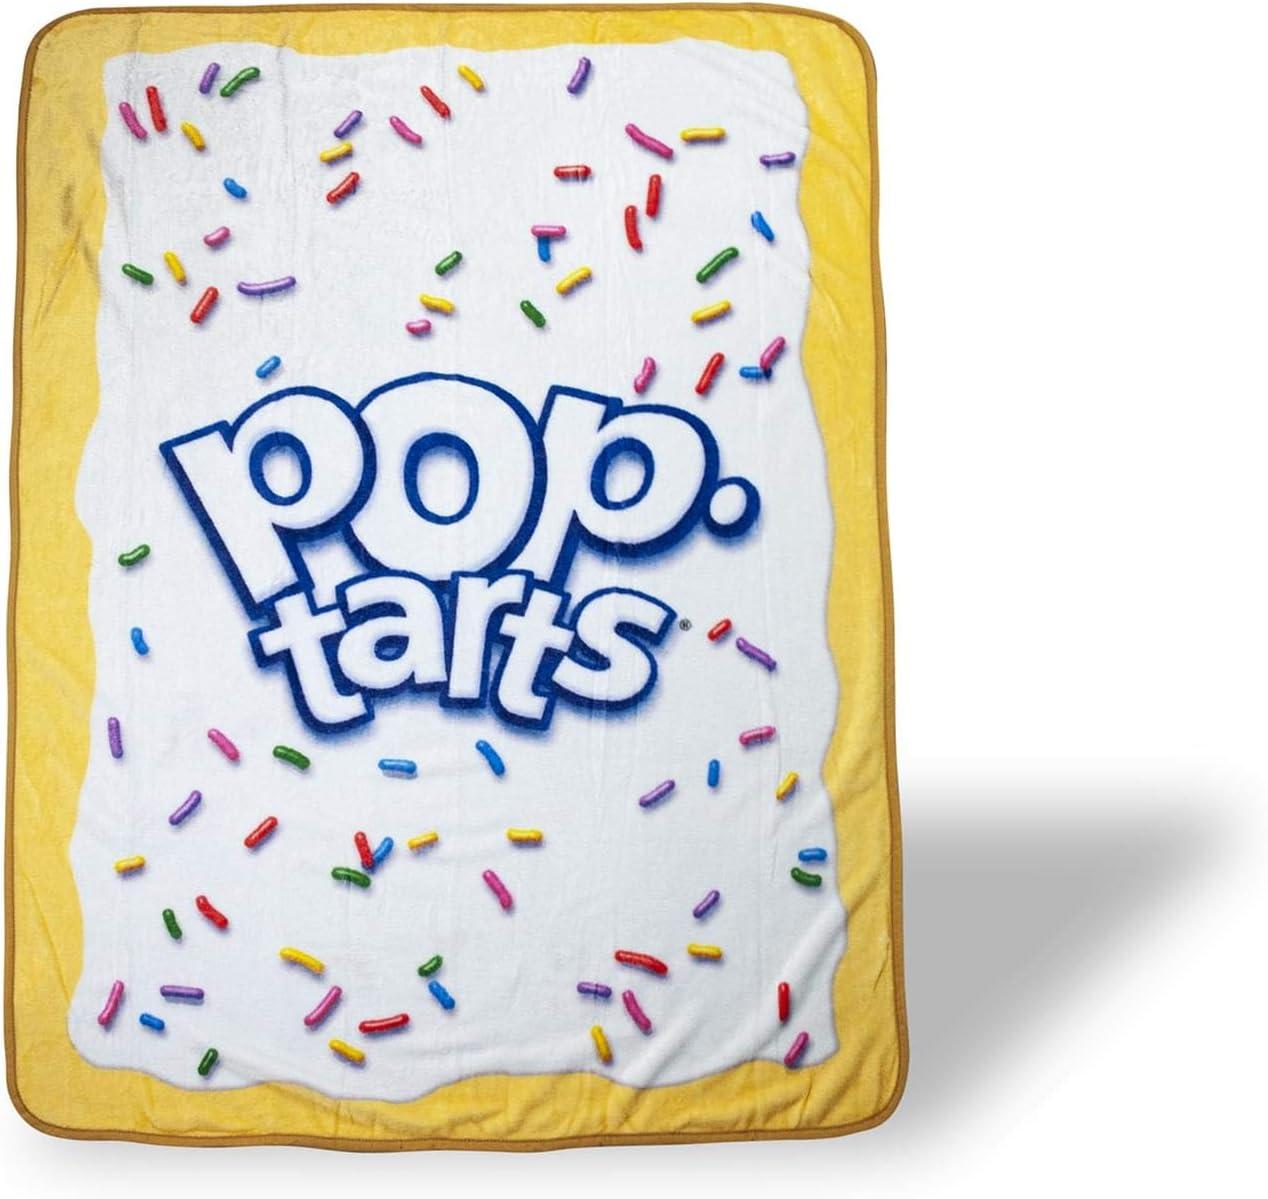 Kellogg's Pop-Tarts Pop-Tart Large Fleece Throw Blanket | Pop-Tarts Soft Blankets And Throws | Official Pop-Tarts Throw Blankets | Measures 60 x 45 Inches